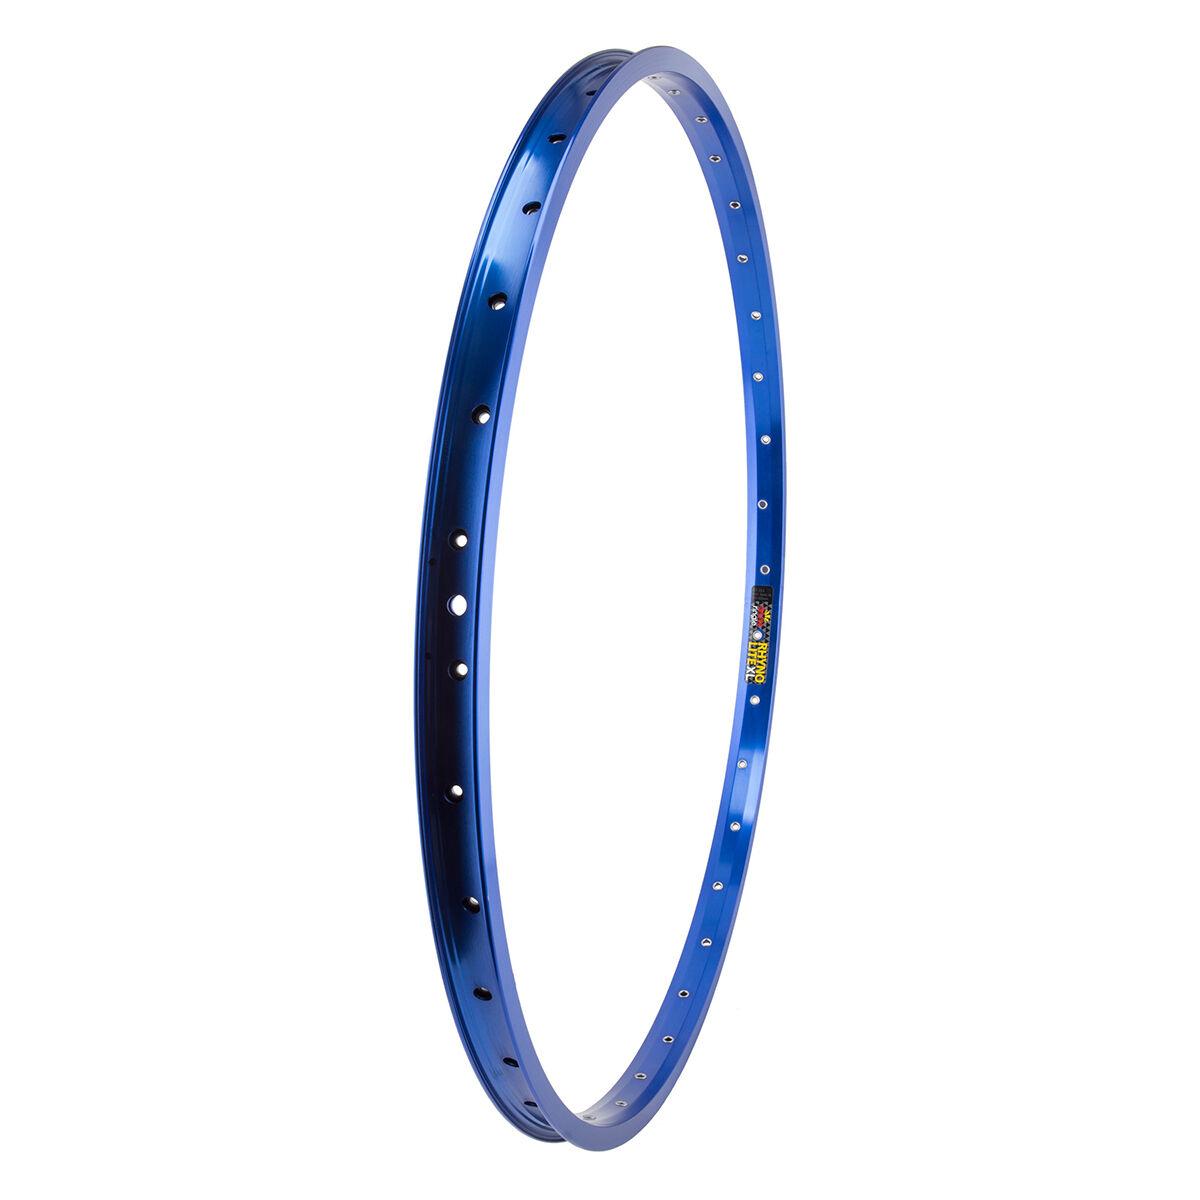 Llantas par Sun 29 622x23.5 Rhyno Lite XL 36 Azul-ABT MSW con ojo MTB BMX 29ER